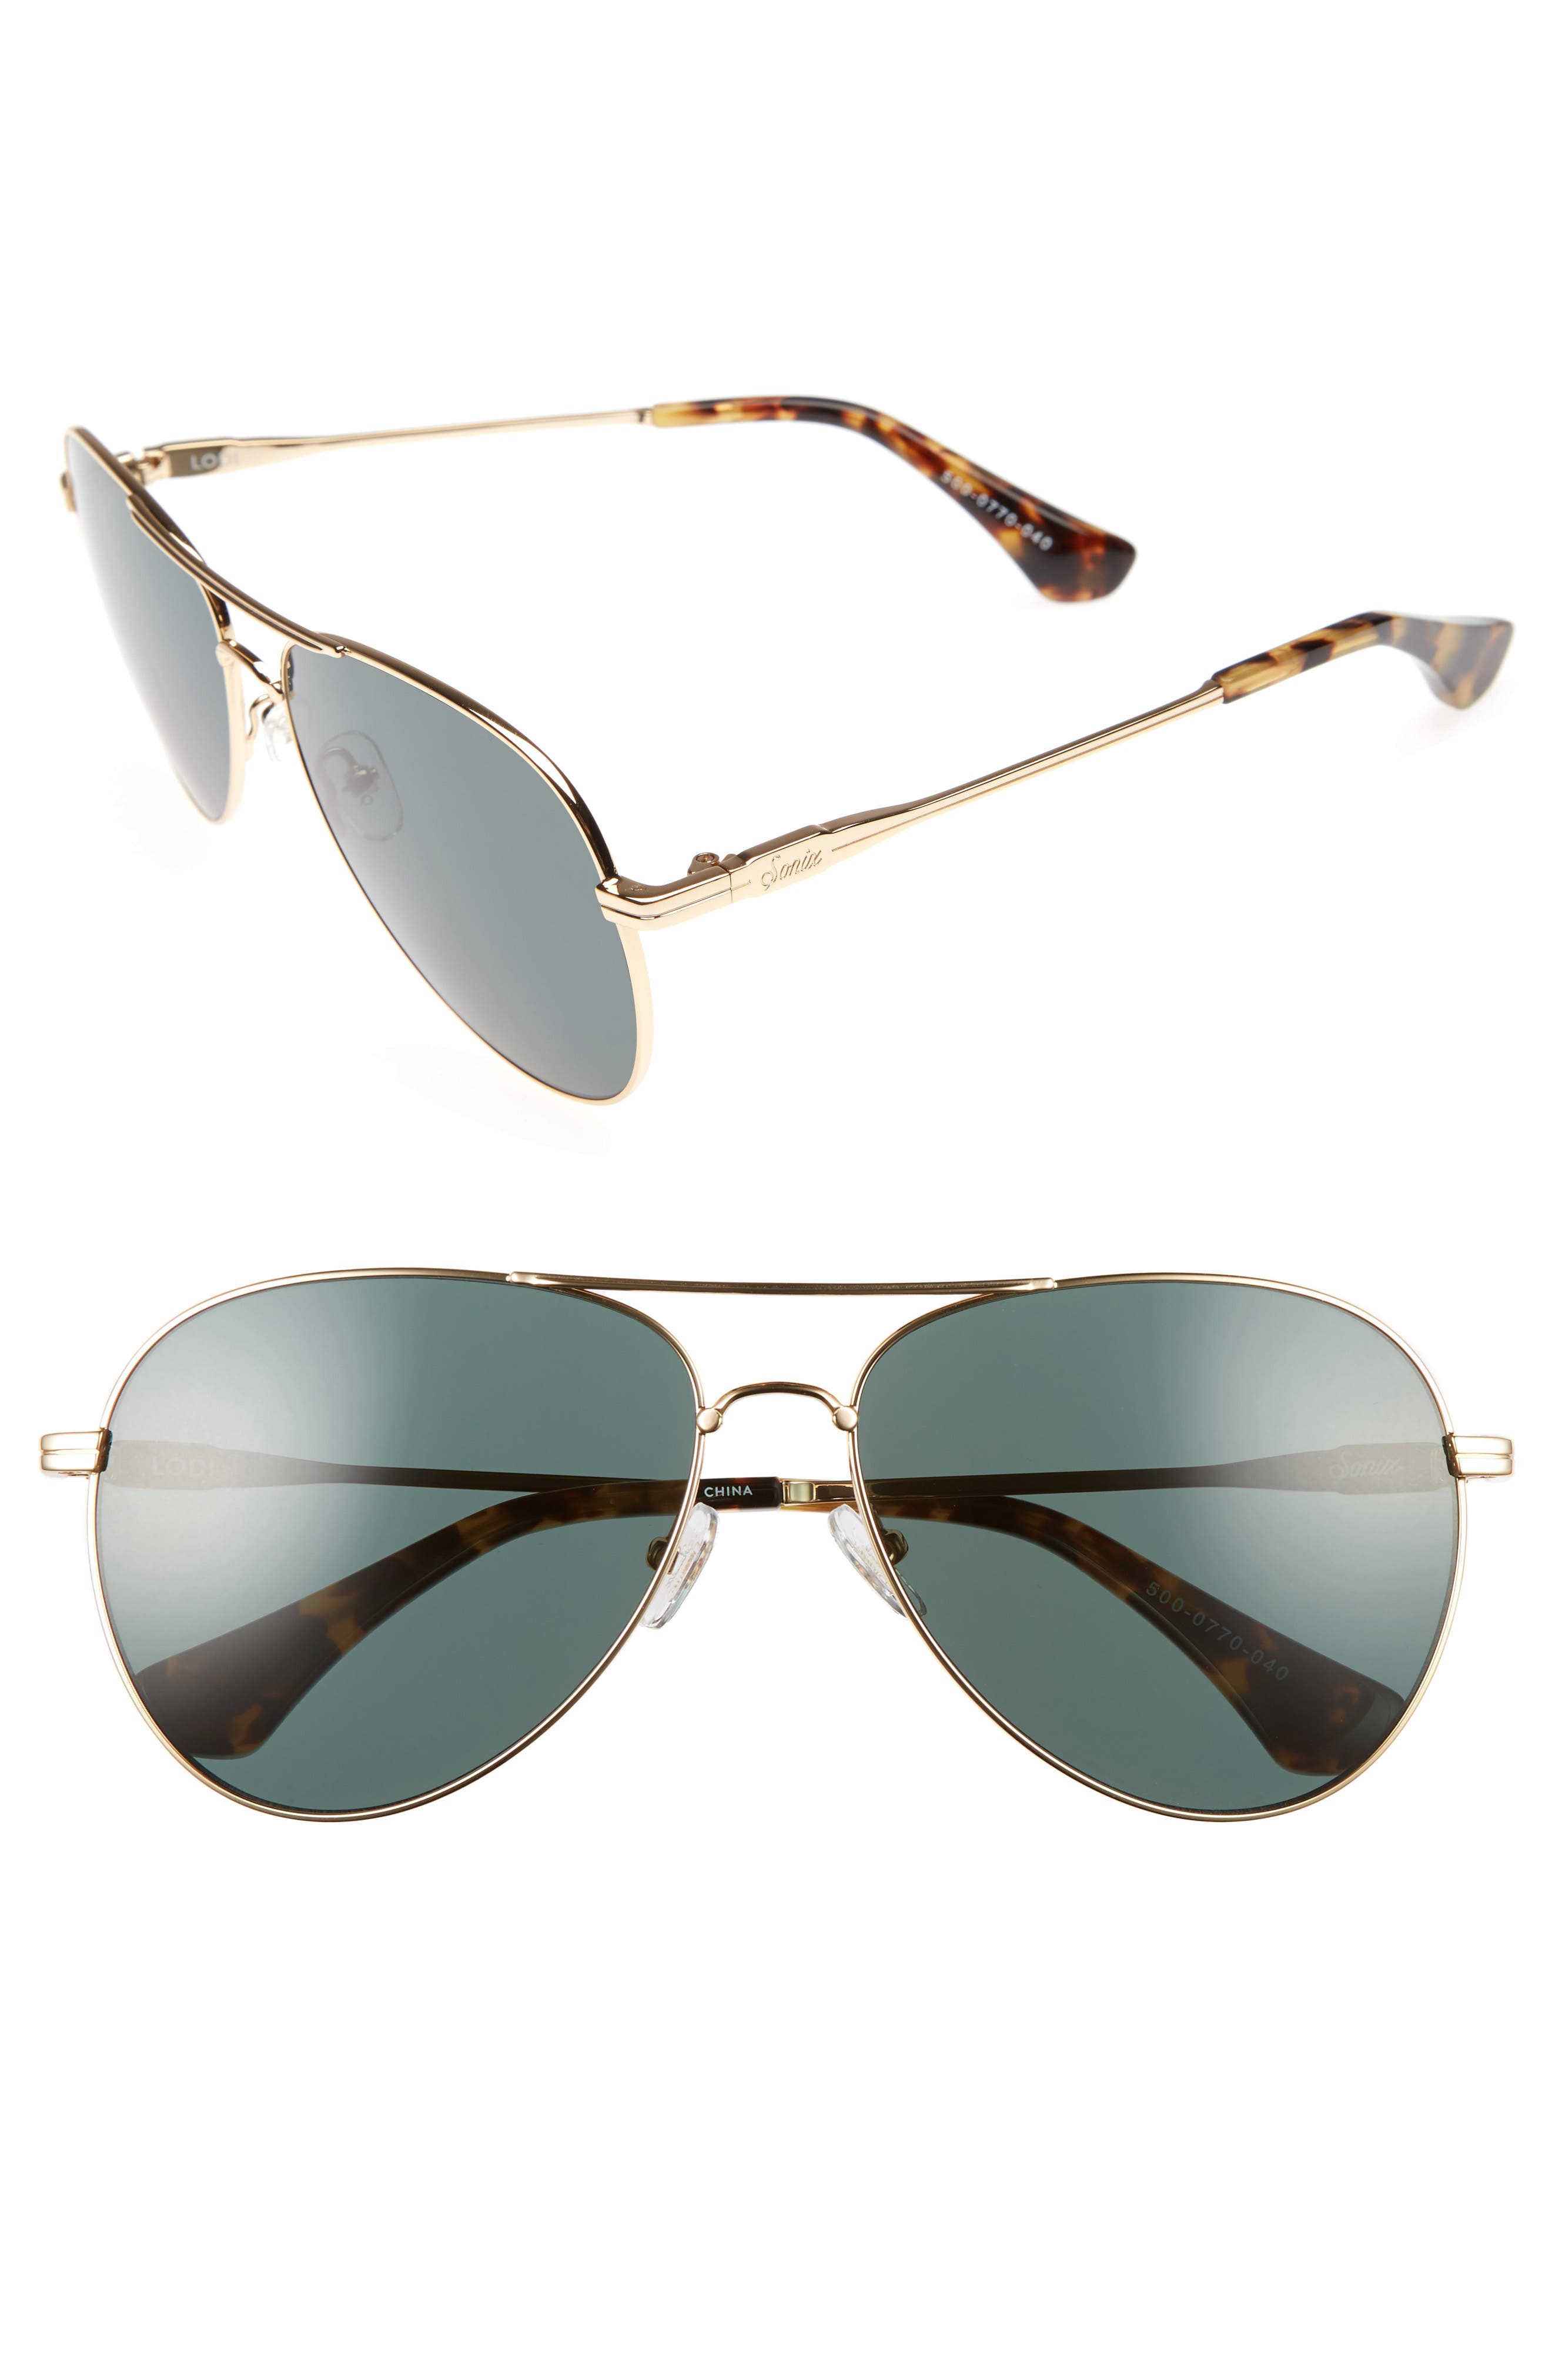 Lodi 62mm Mirrored Aviator Sunglasses,                             Alternate thumbnail 3, color,                             710